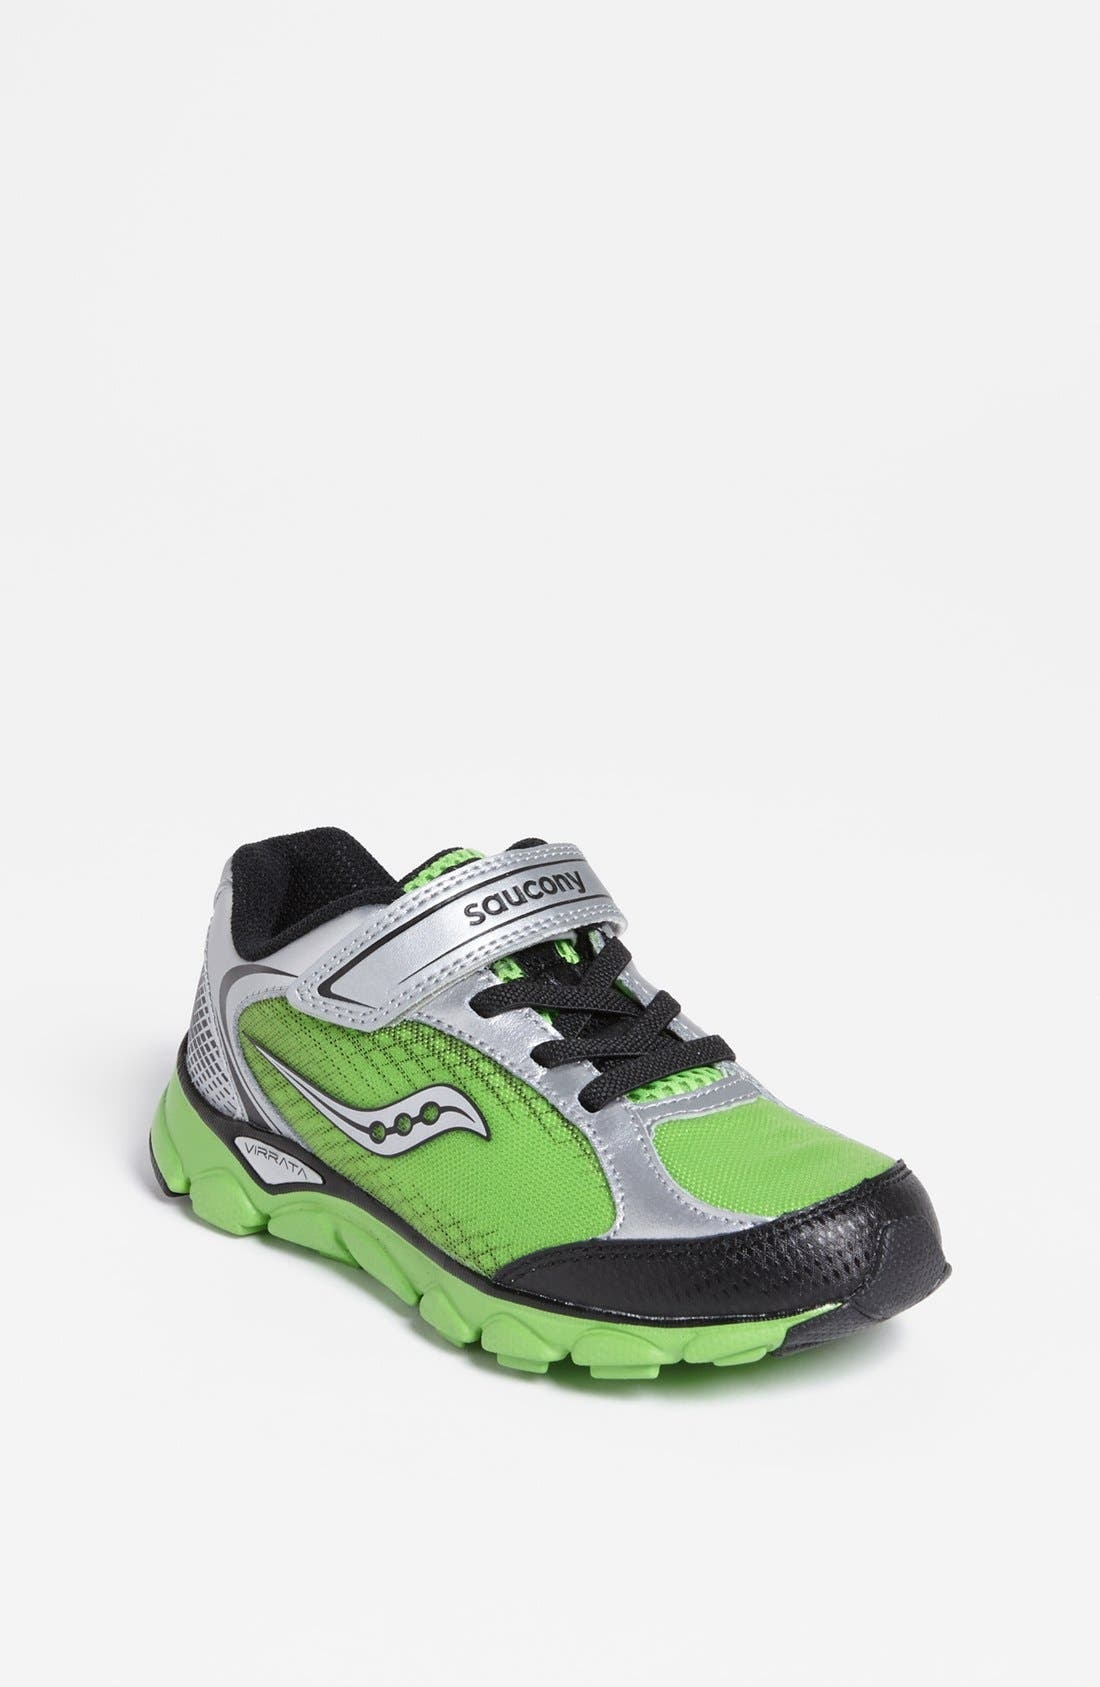 Main Image - Saucony 'Virrata' Sneaker (Toddler & Little Kid)